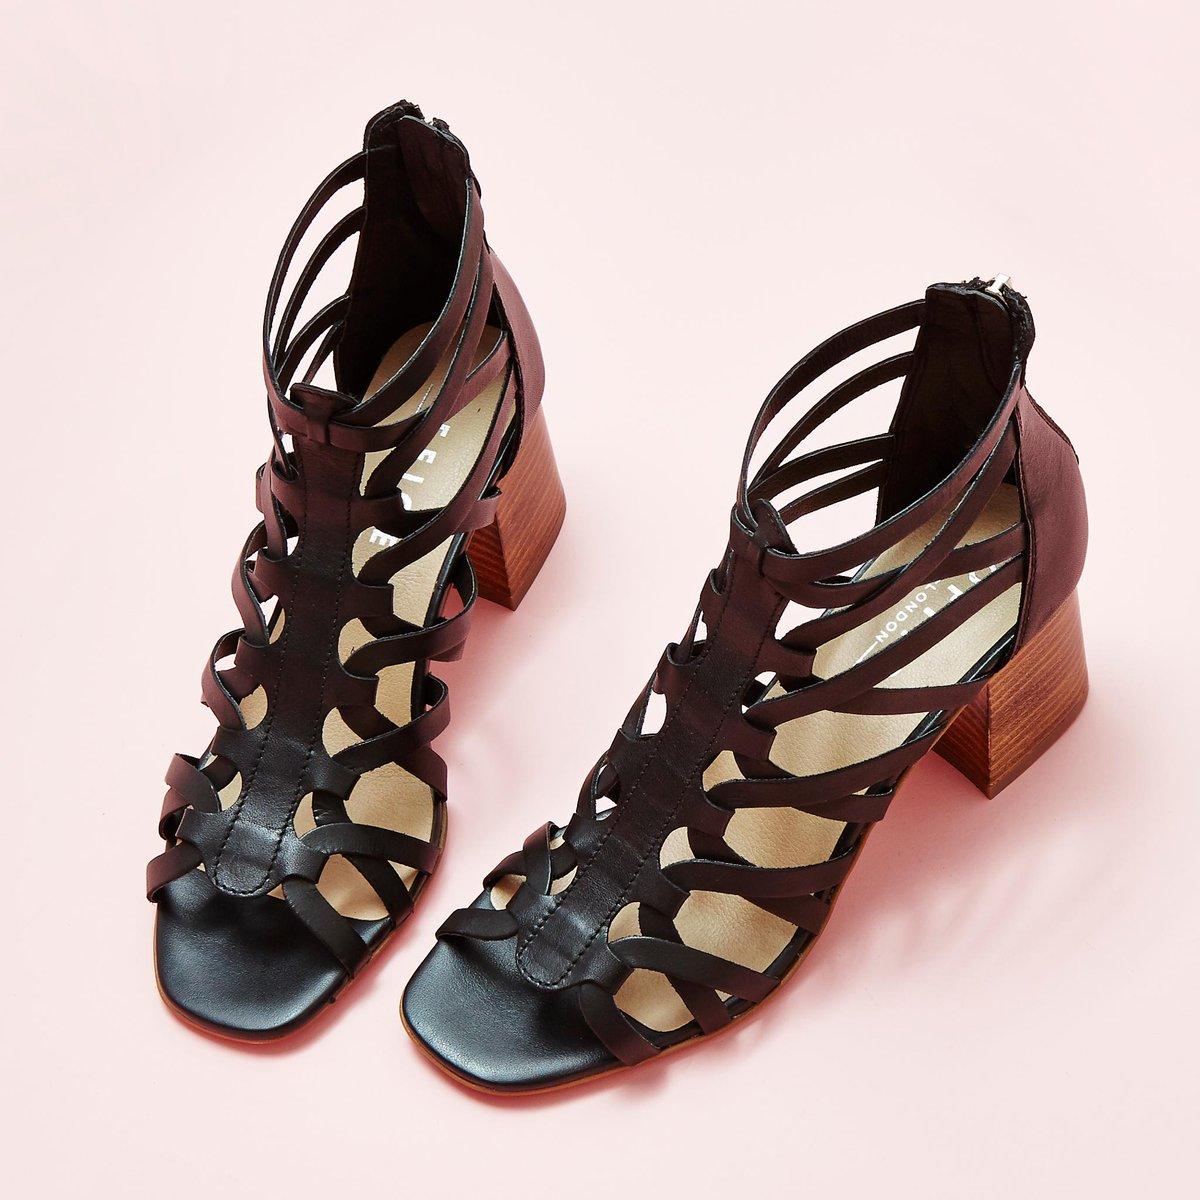 office shoes dublin. Office Shoes Dublin. 1 Reply 0 Retweets 7 Likes Dublin